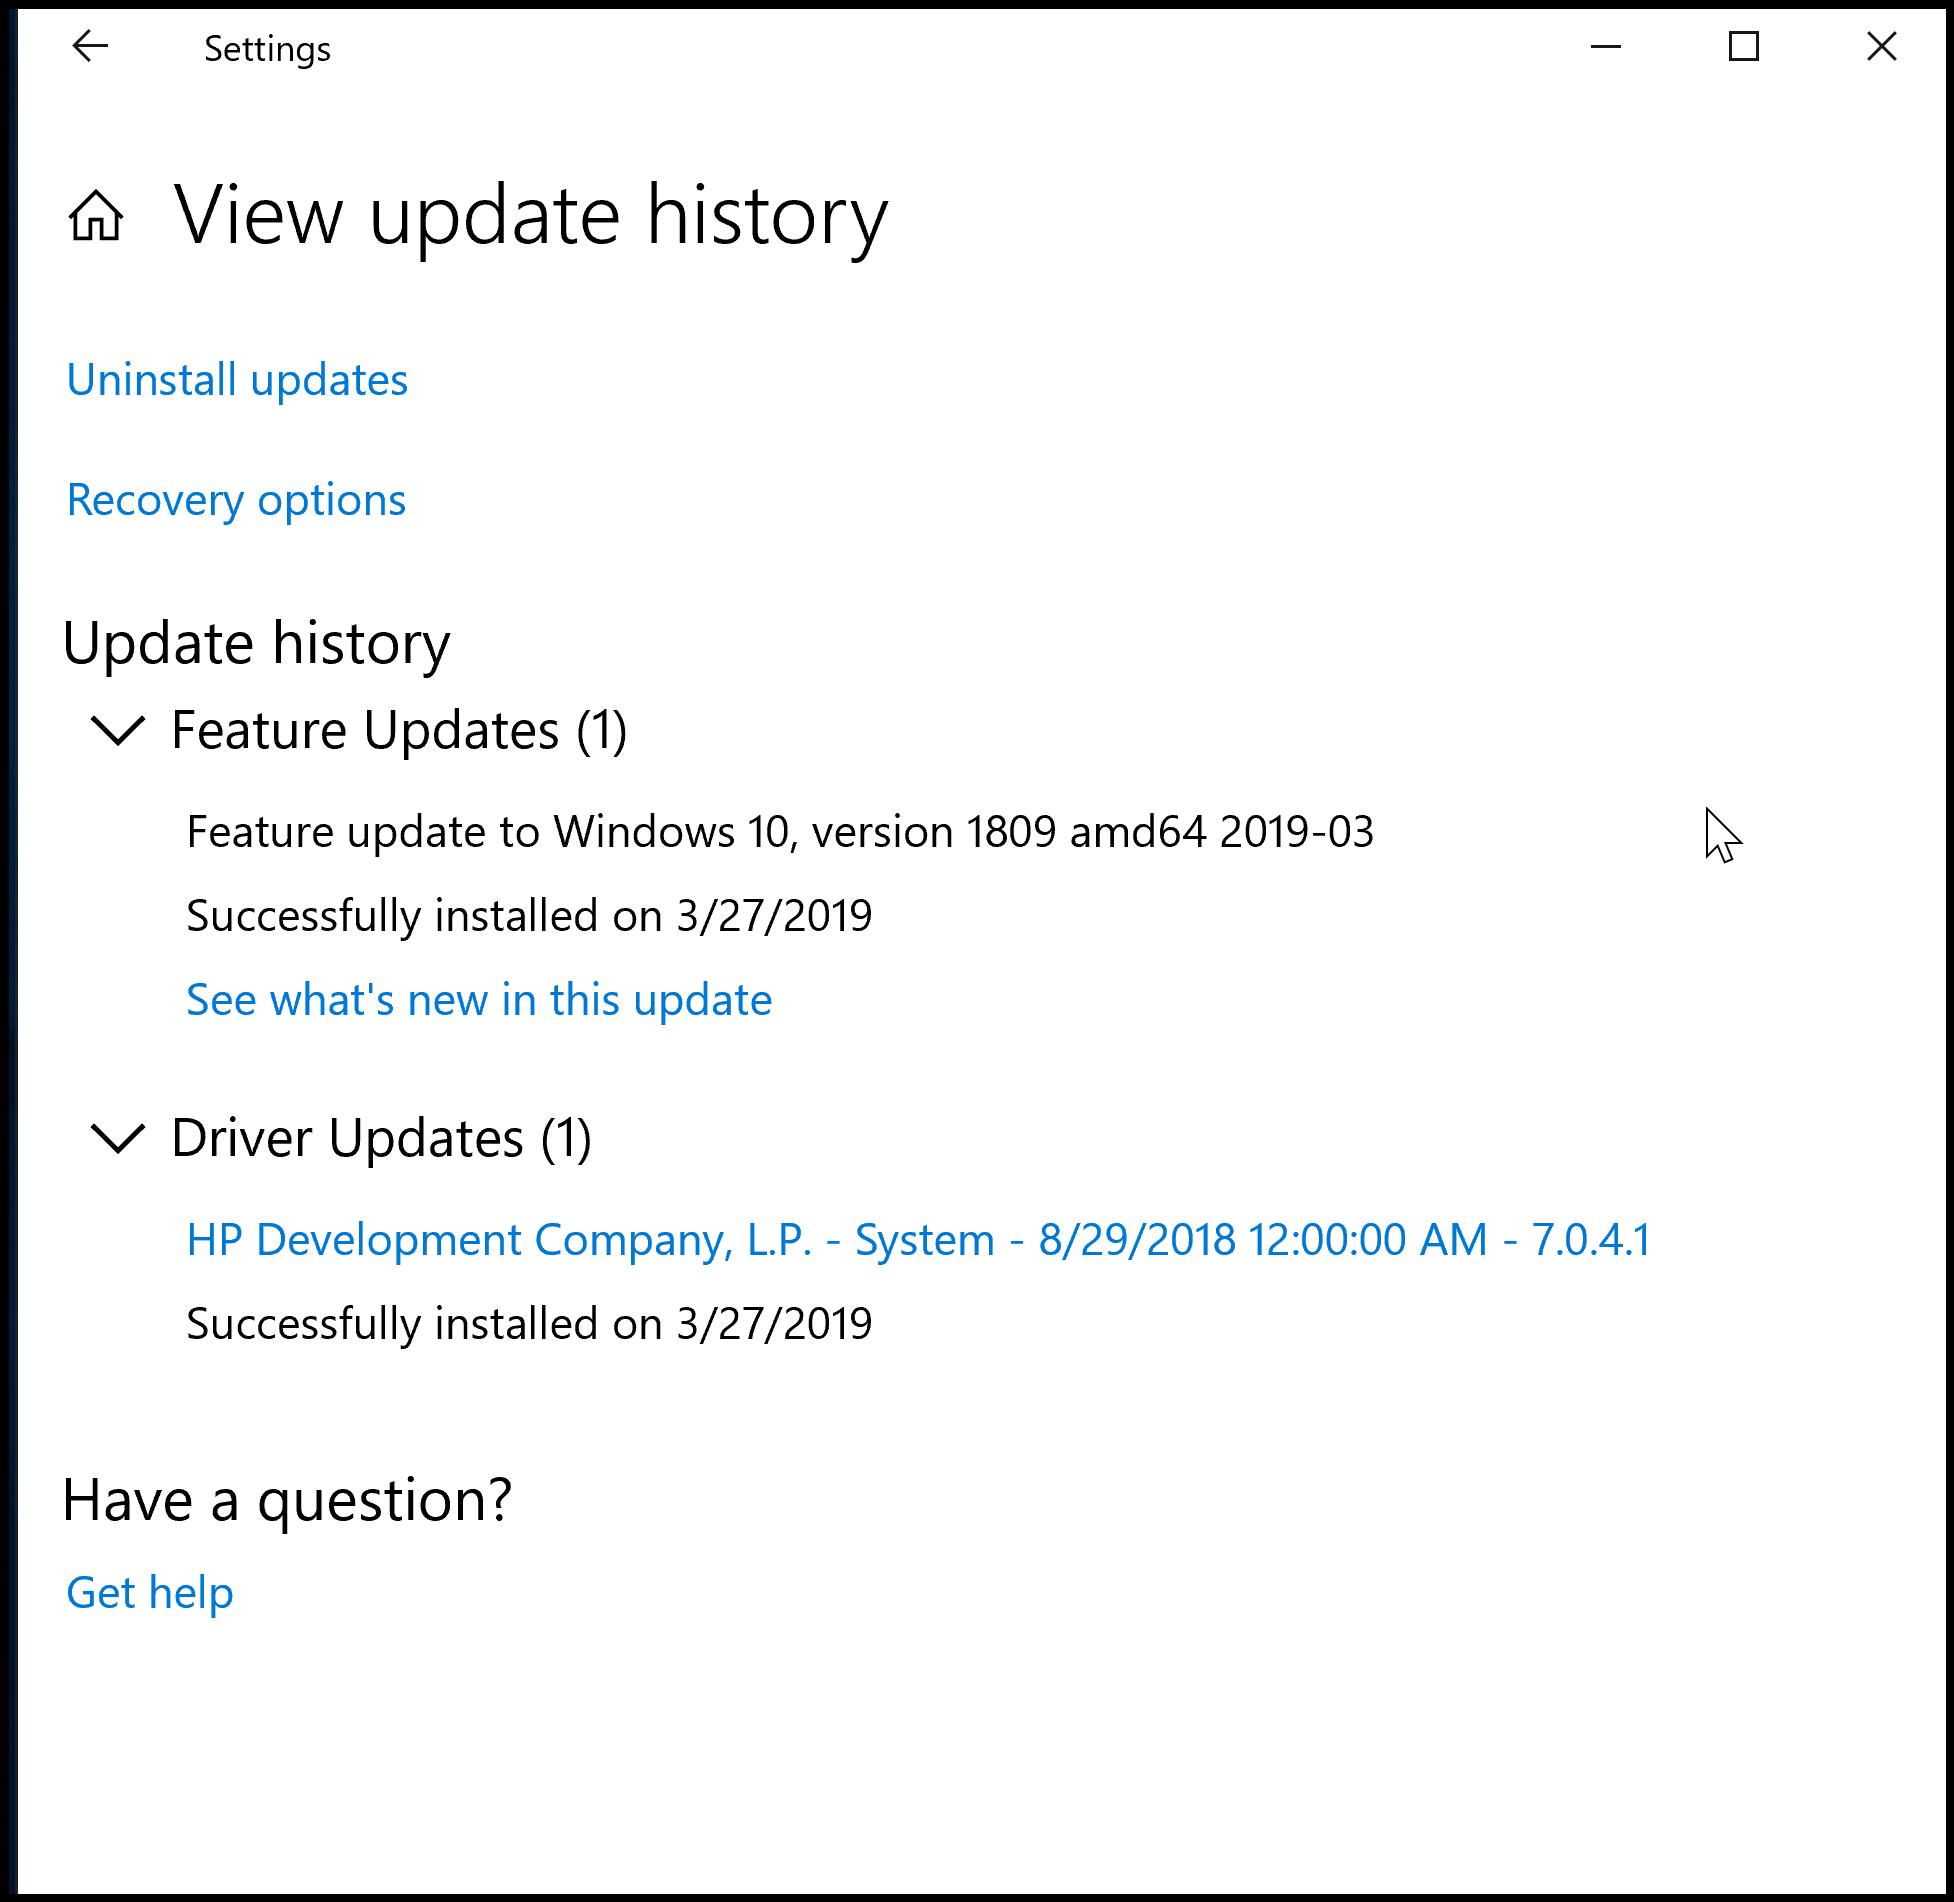 Feature update to Windows 10, version 1809 amd64 2019 03